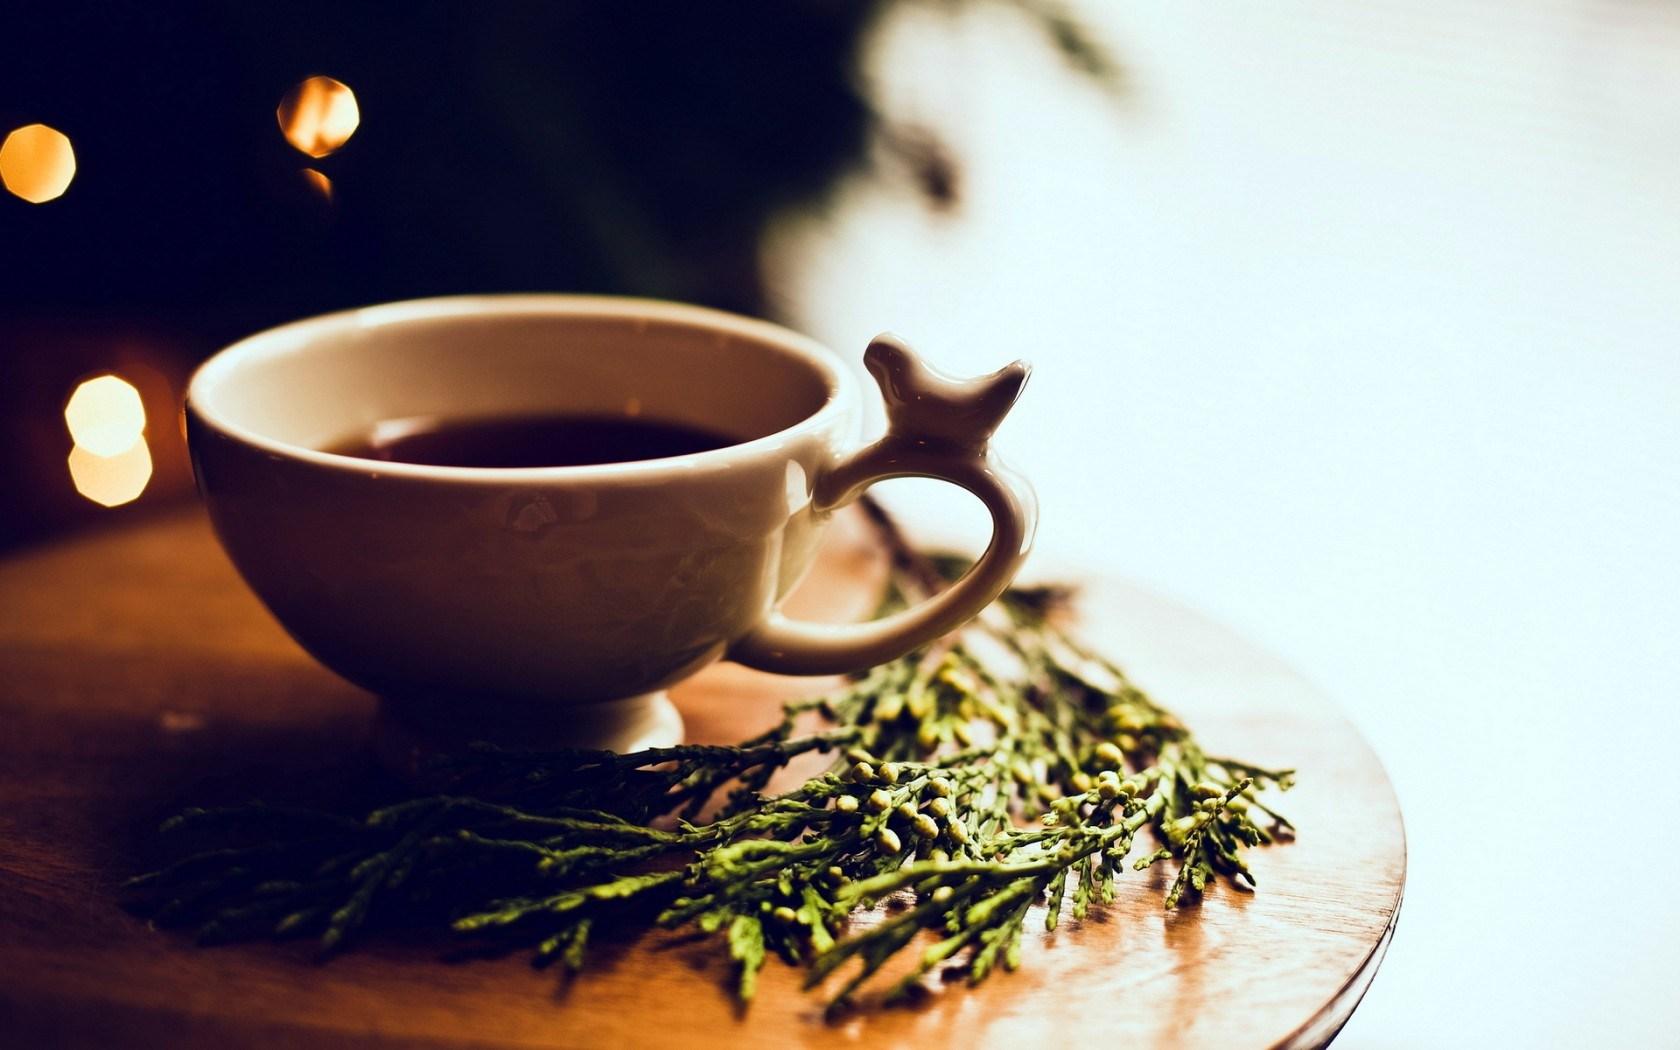 Free Tea Cup Wallpaper 42214 1920x1080 px